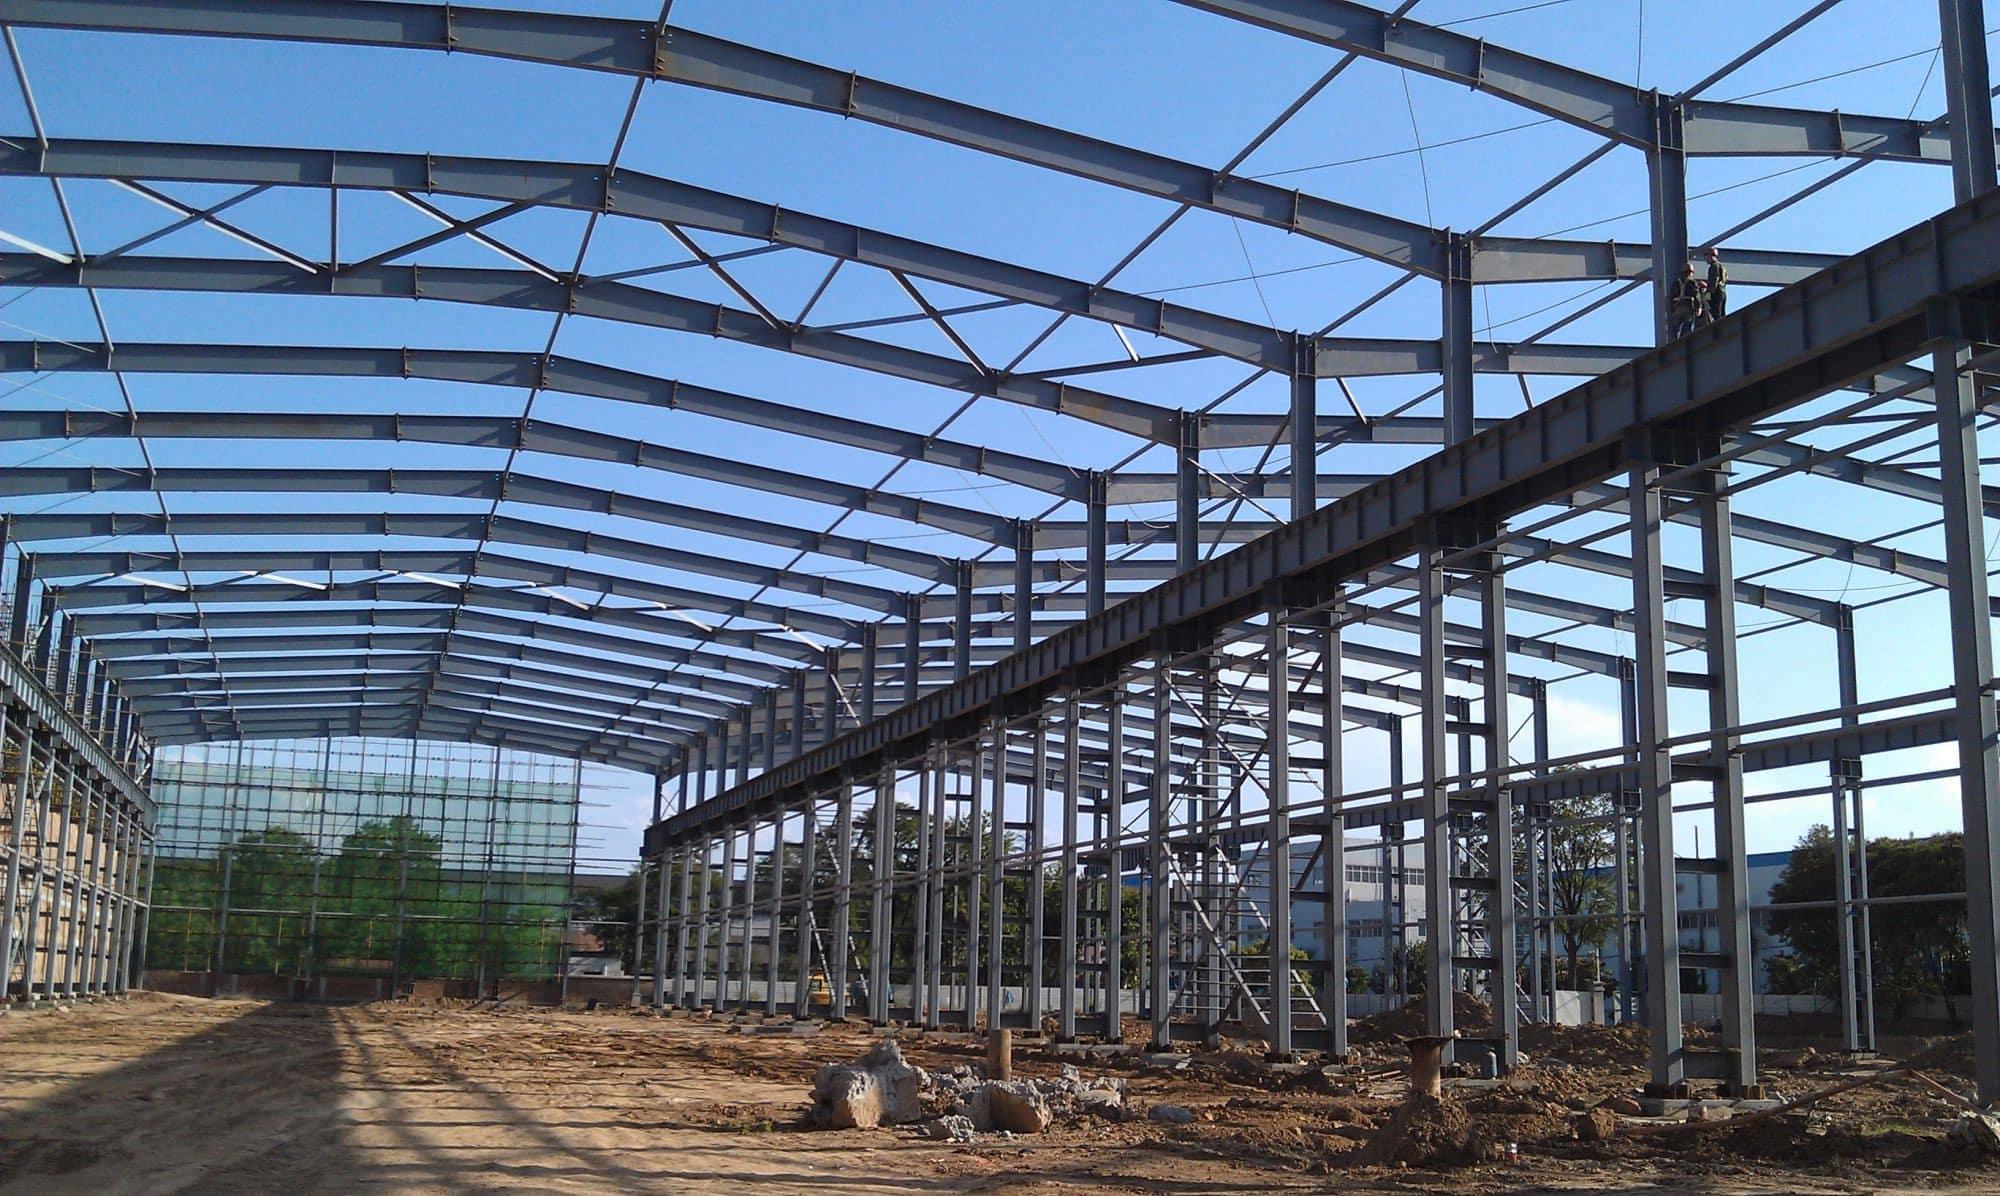 Dorian Build 3600 Square Meters Steel Building in Burkina Faso 08